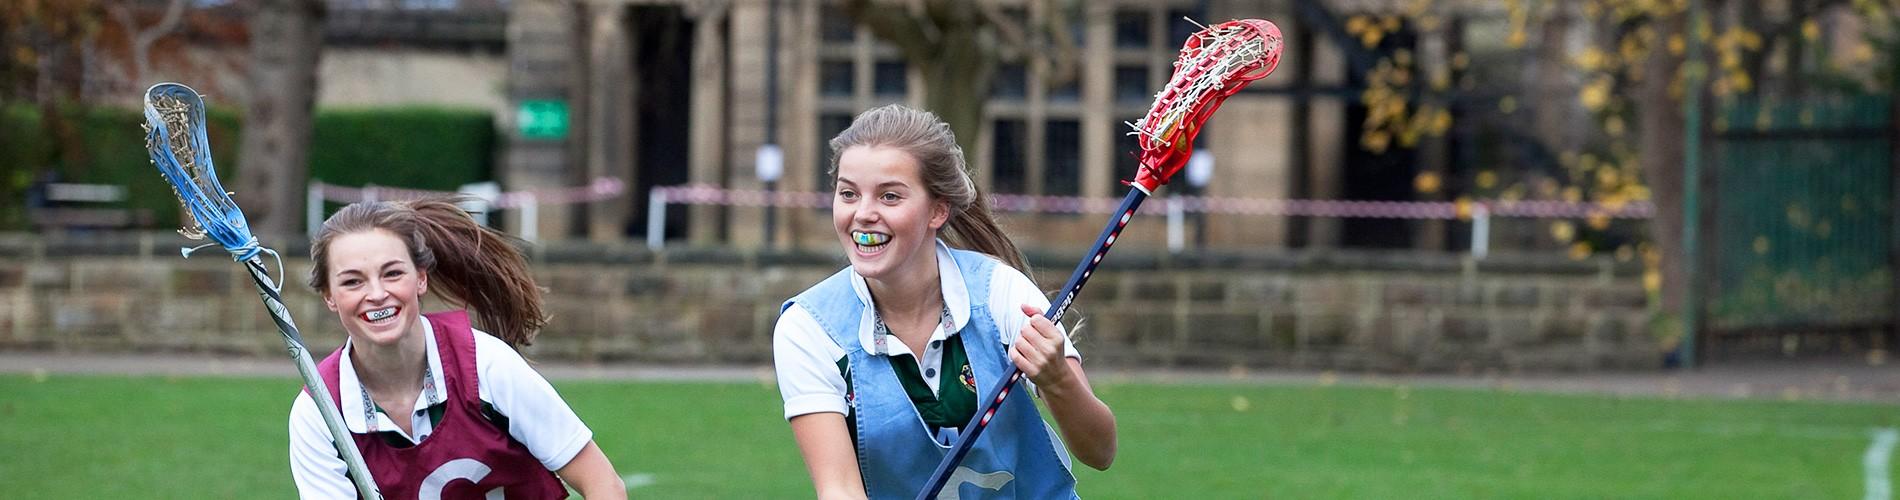 Harrogate Ladies College – Lacrosse Match